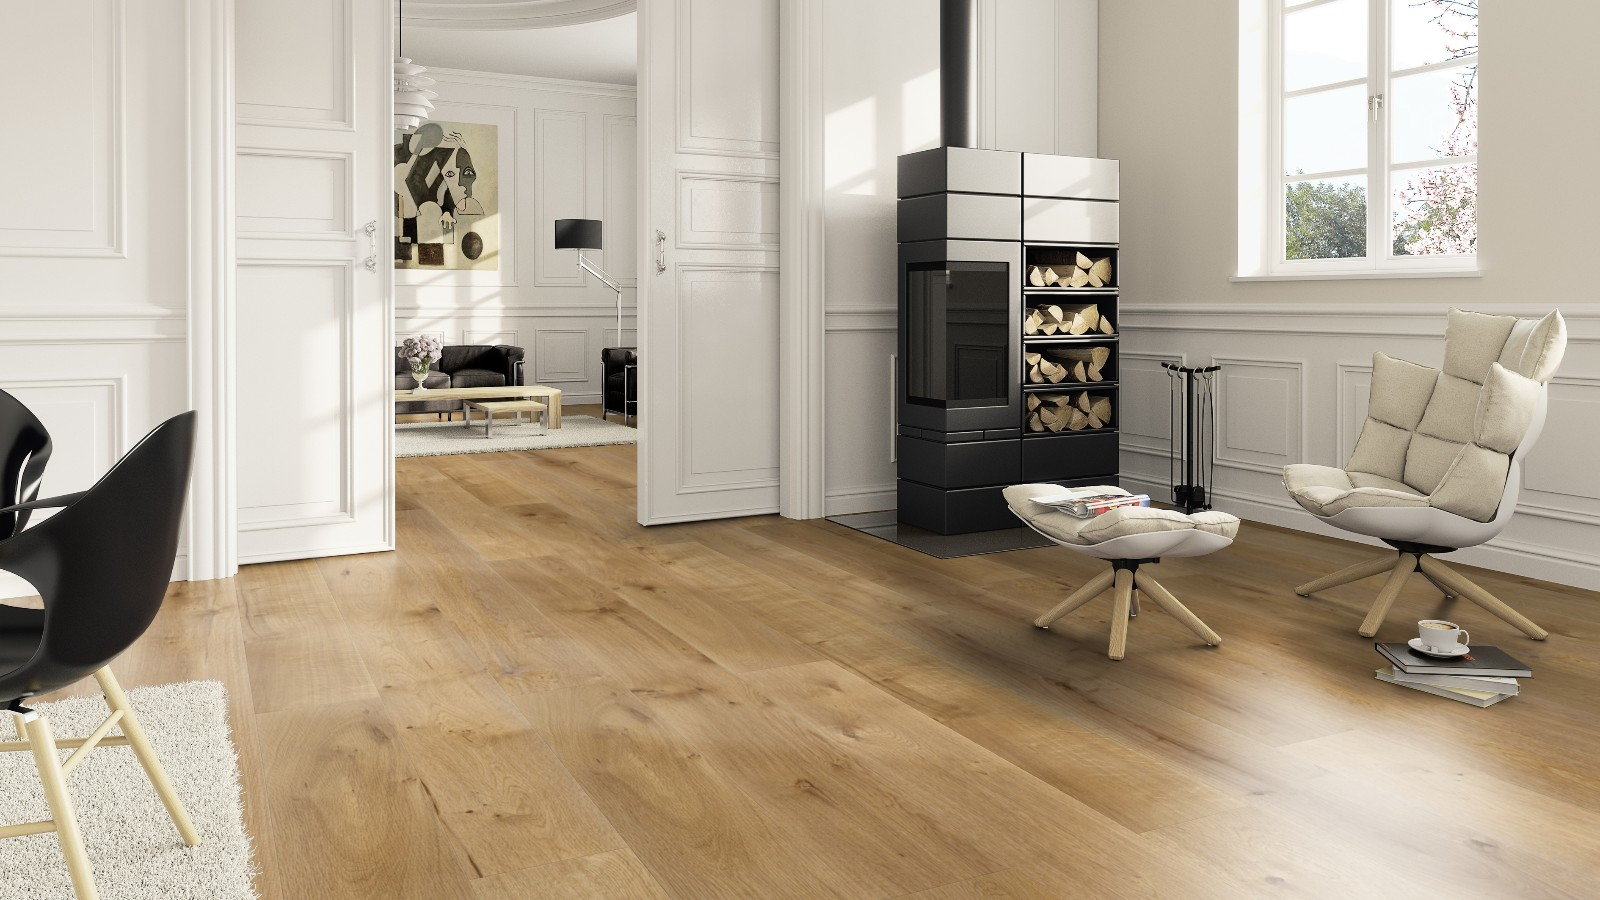 terh rne avatara floor eiche naturbeige 1 stab b03 elegant edition ter h rne avatara. Black Bedroom Furniture Sets. Home Design Ideas